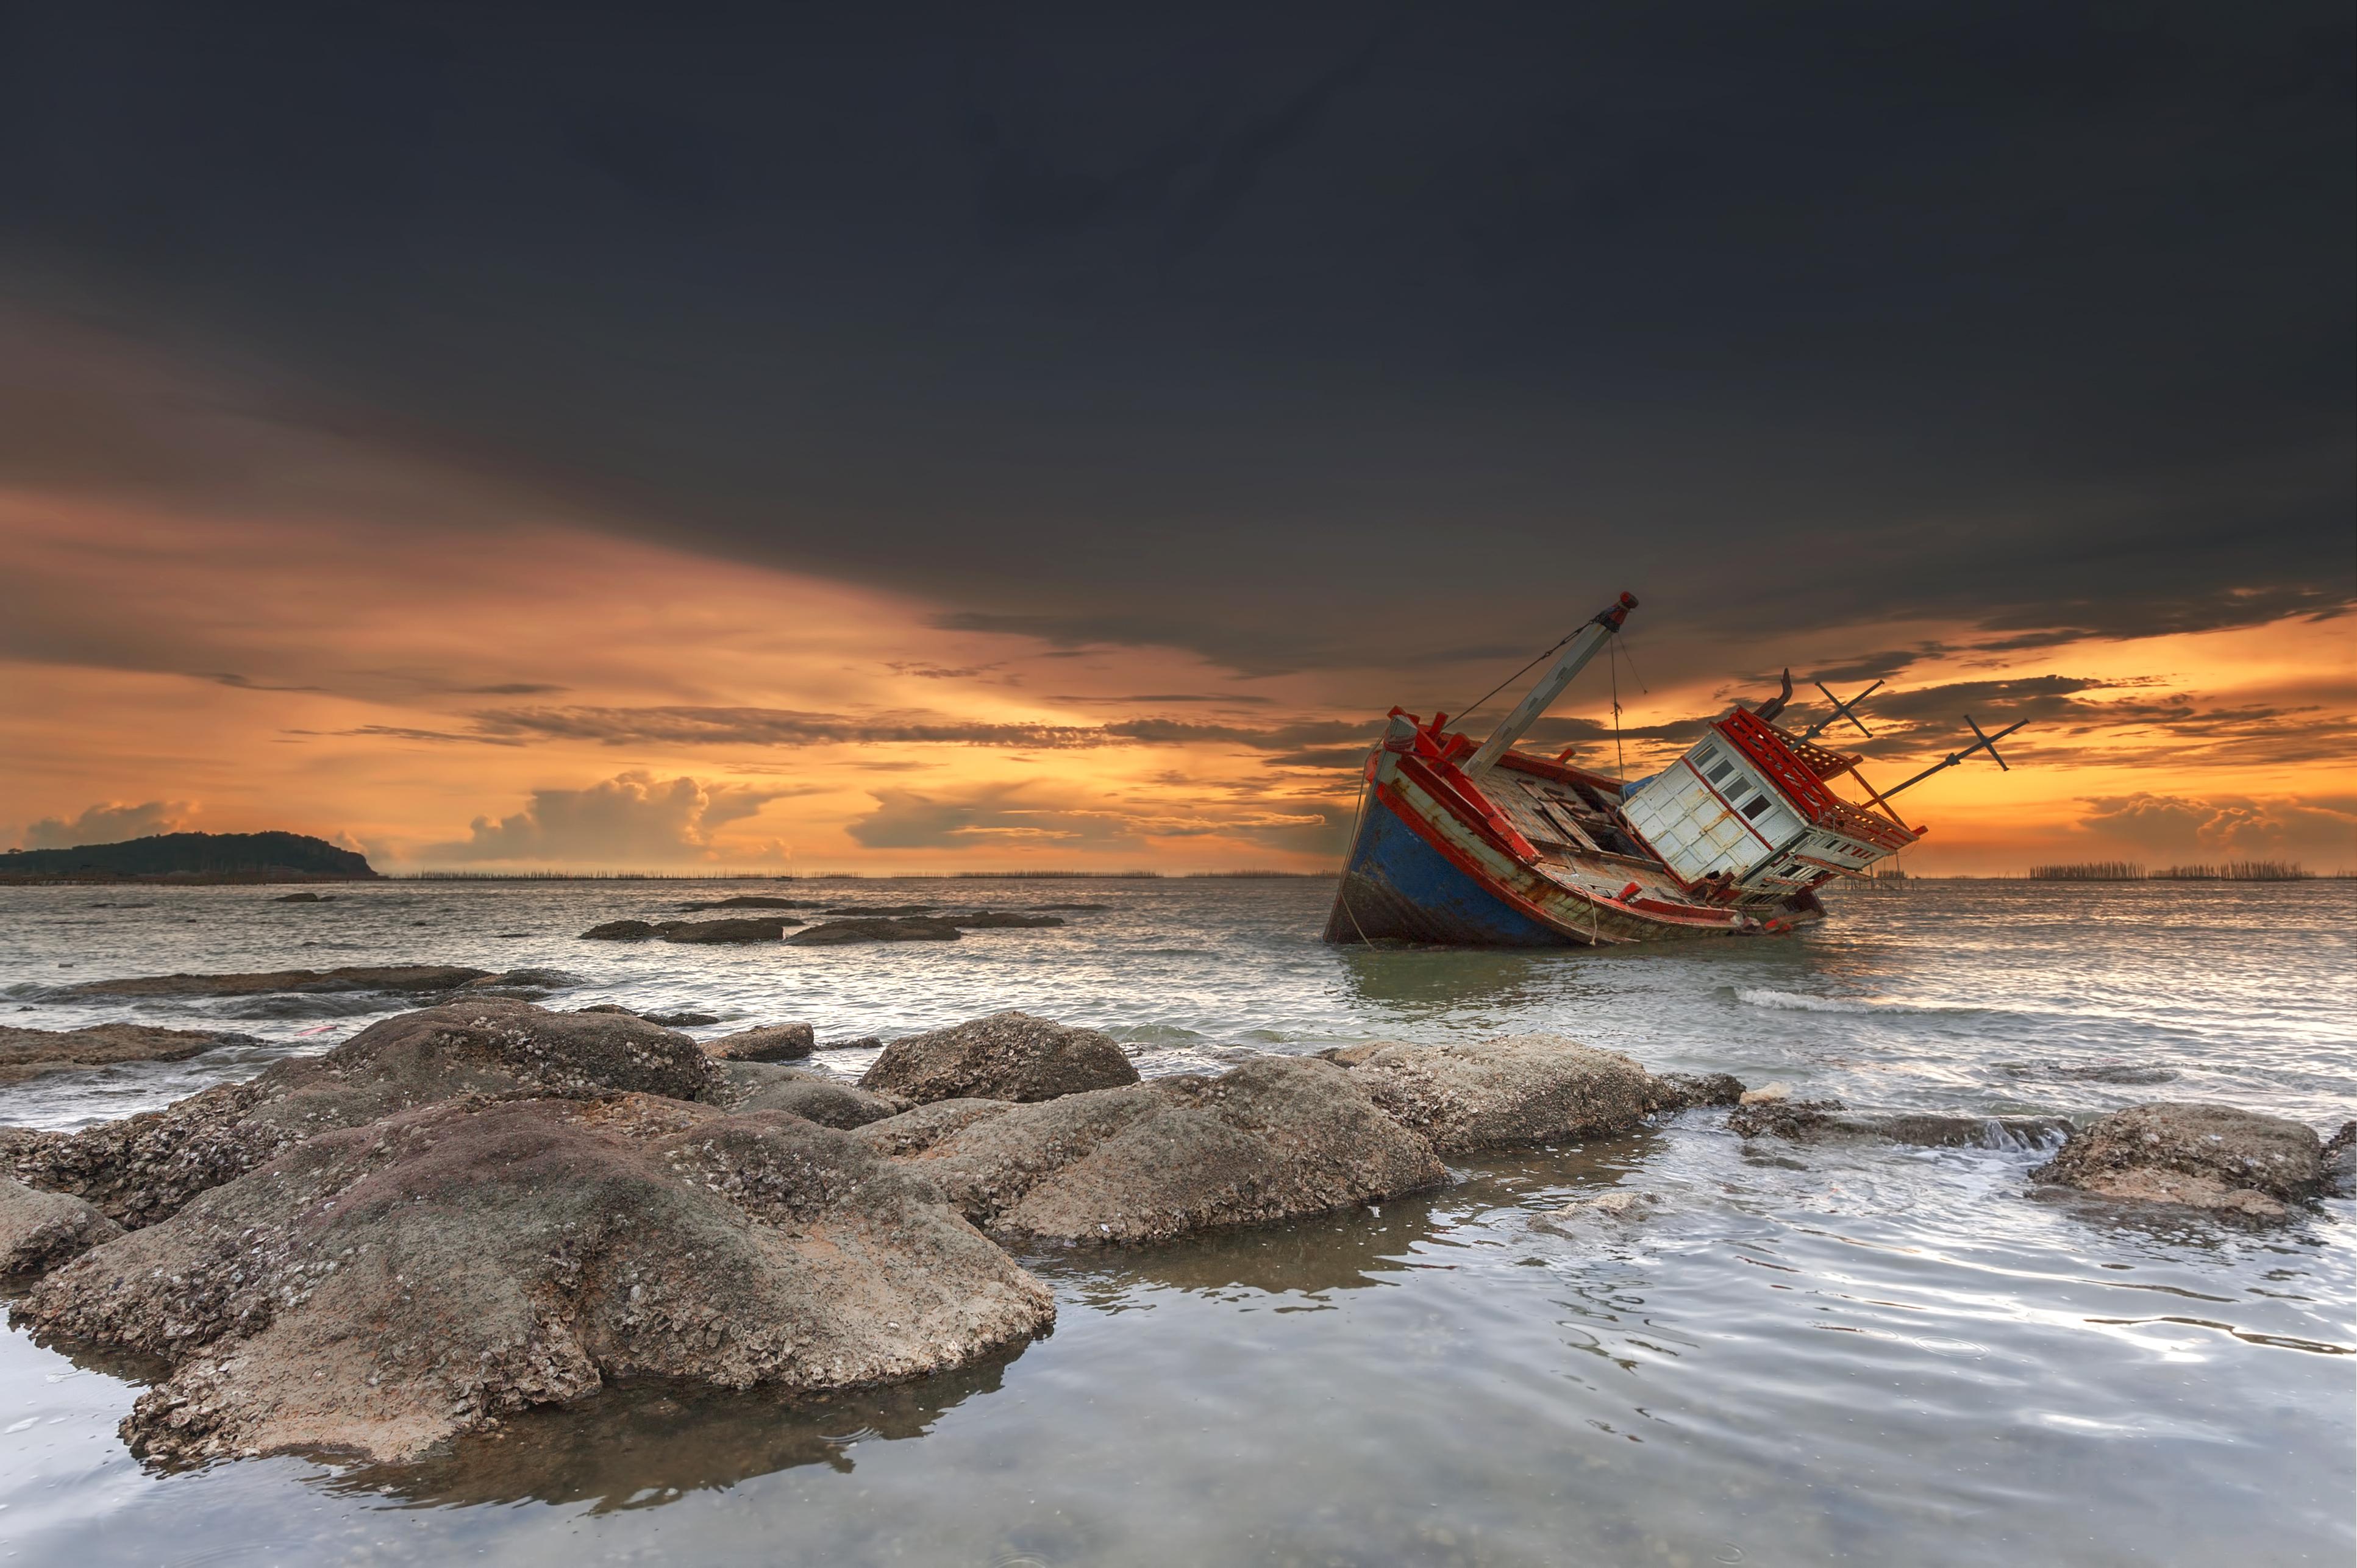 A shipwreck at sunset.